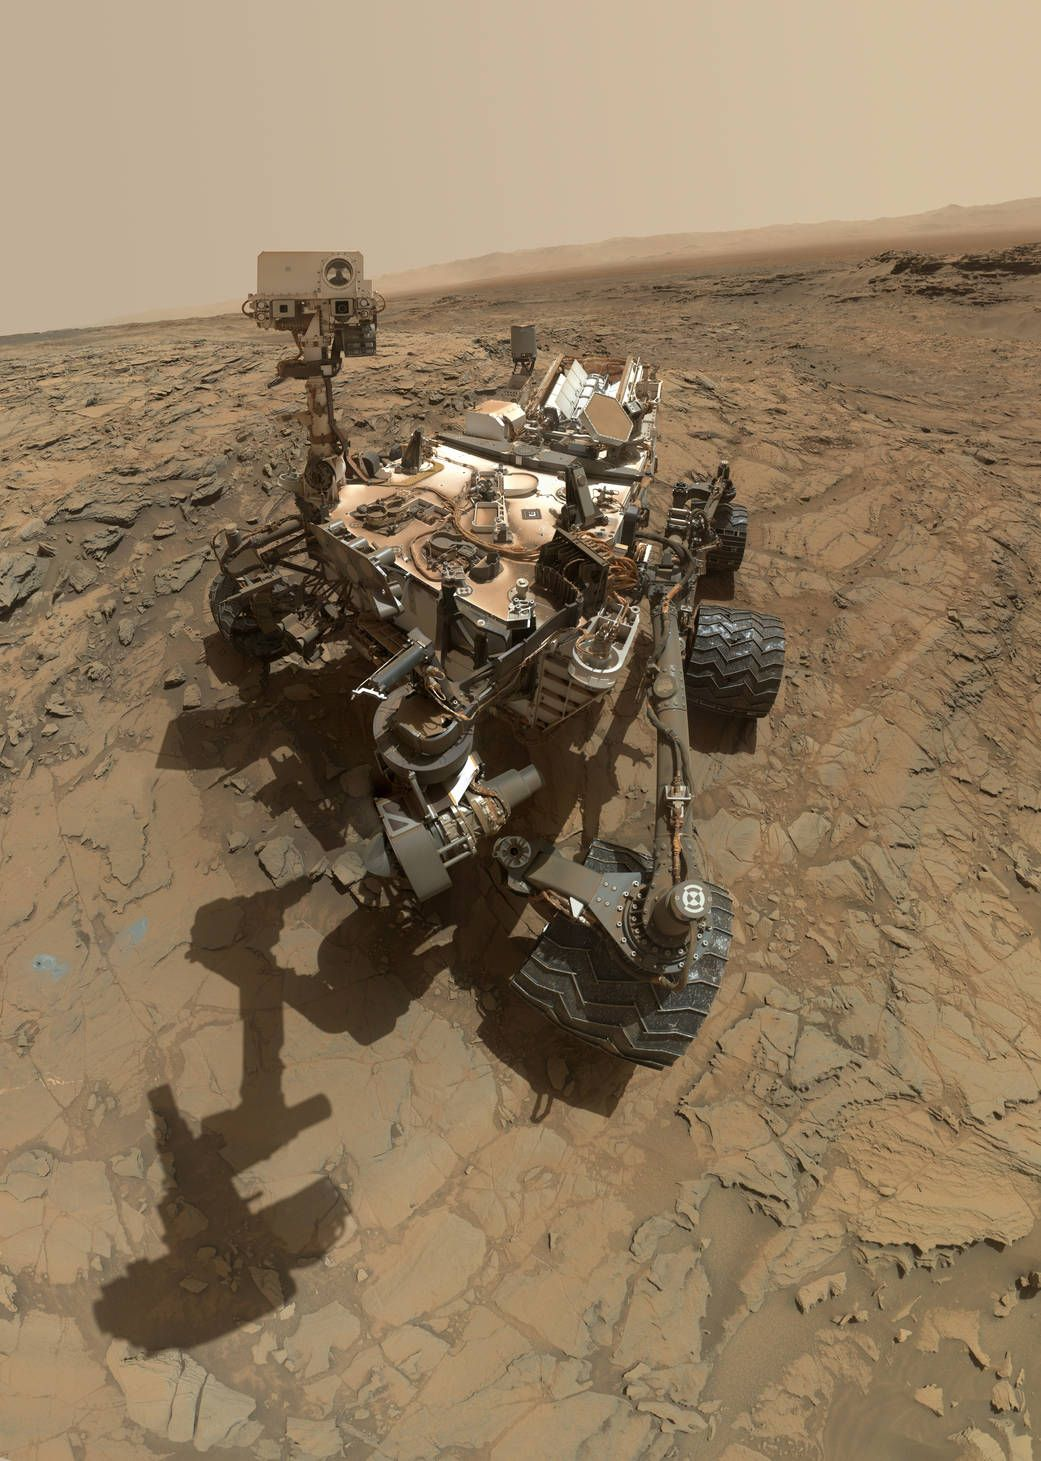 Curiosity Self-Portrait at 'Big Sky' drilling site